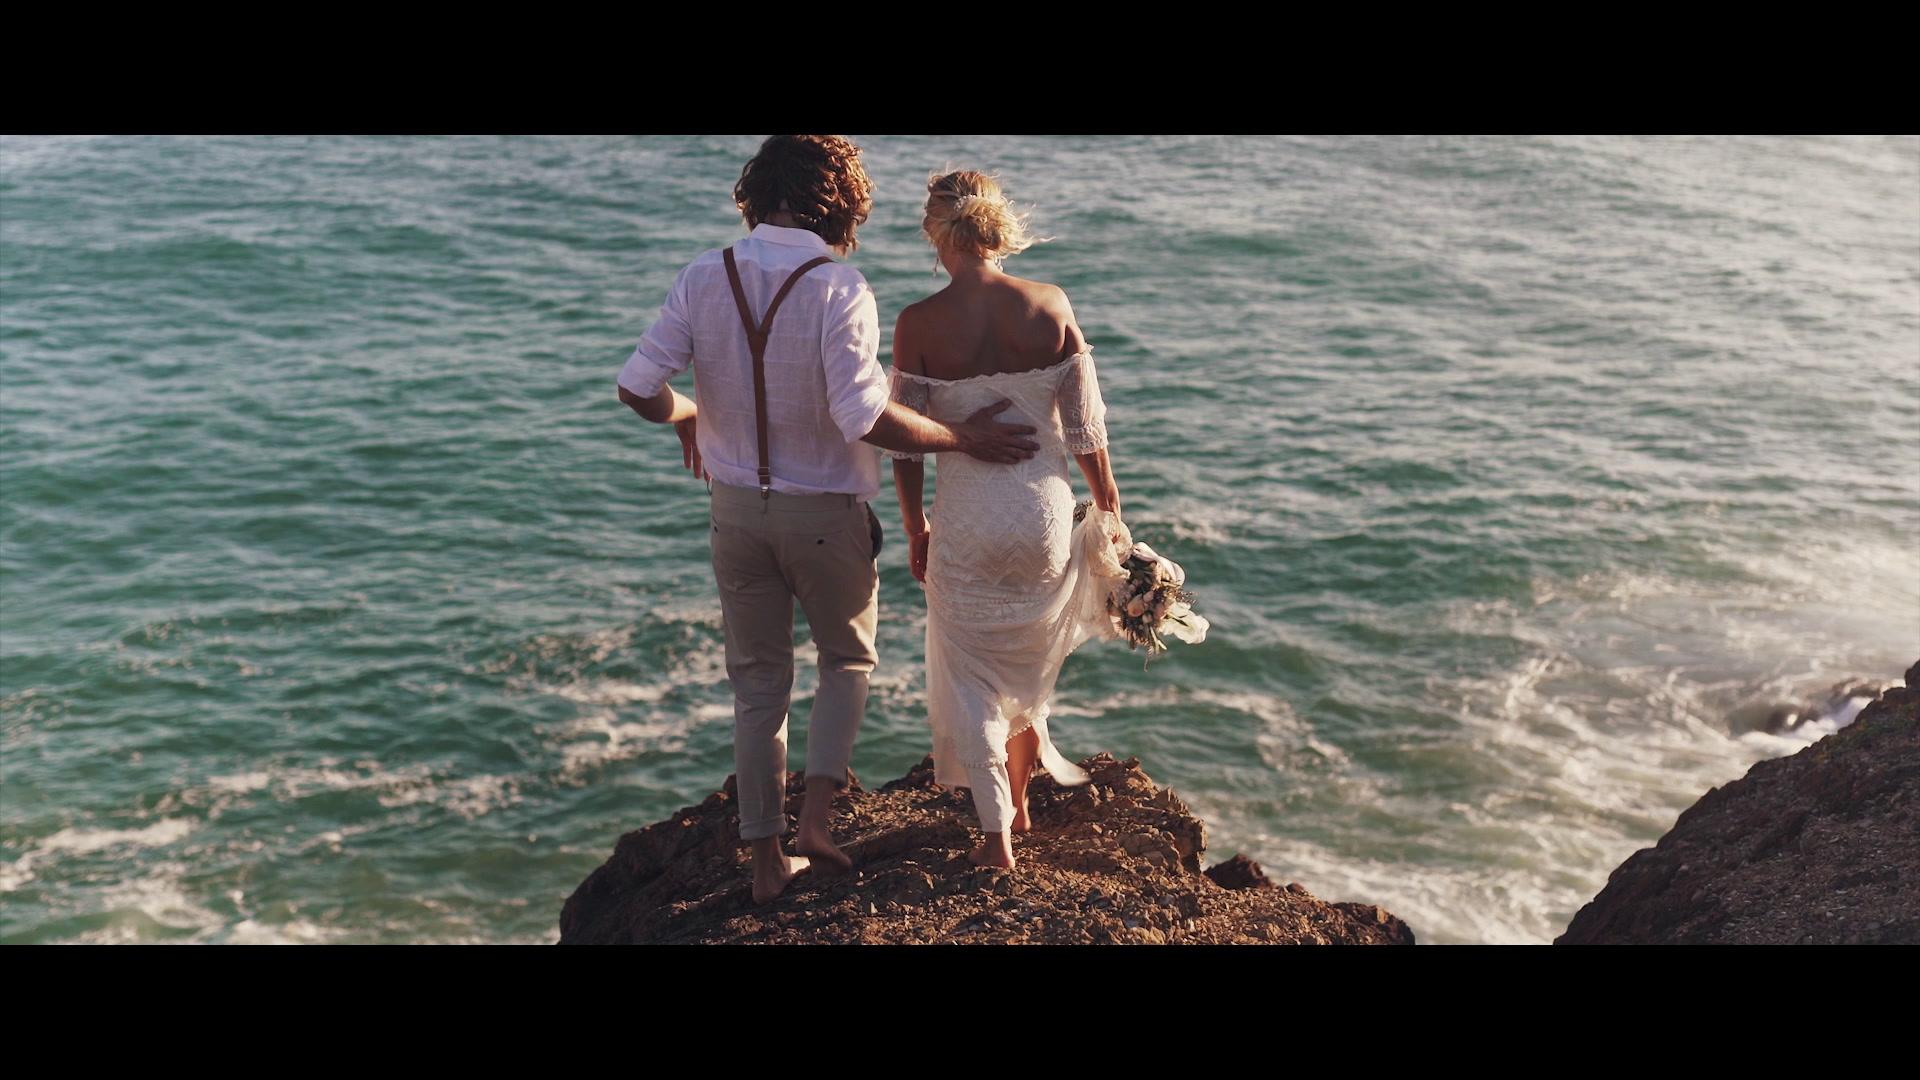 Juda + Lillie | Sapphire Beach, Australia | a mountaintop